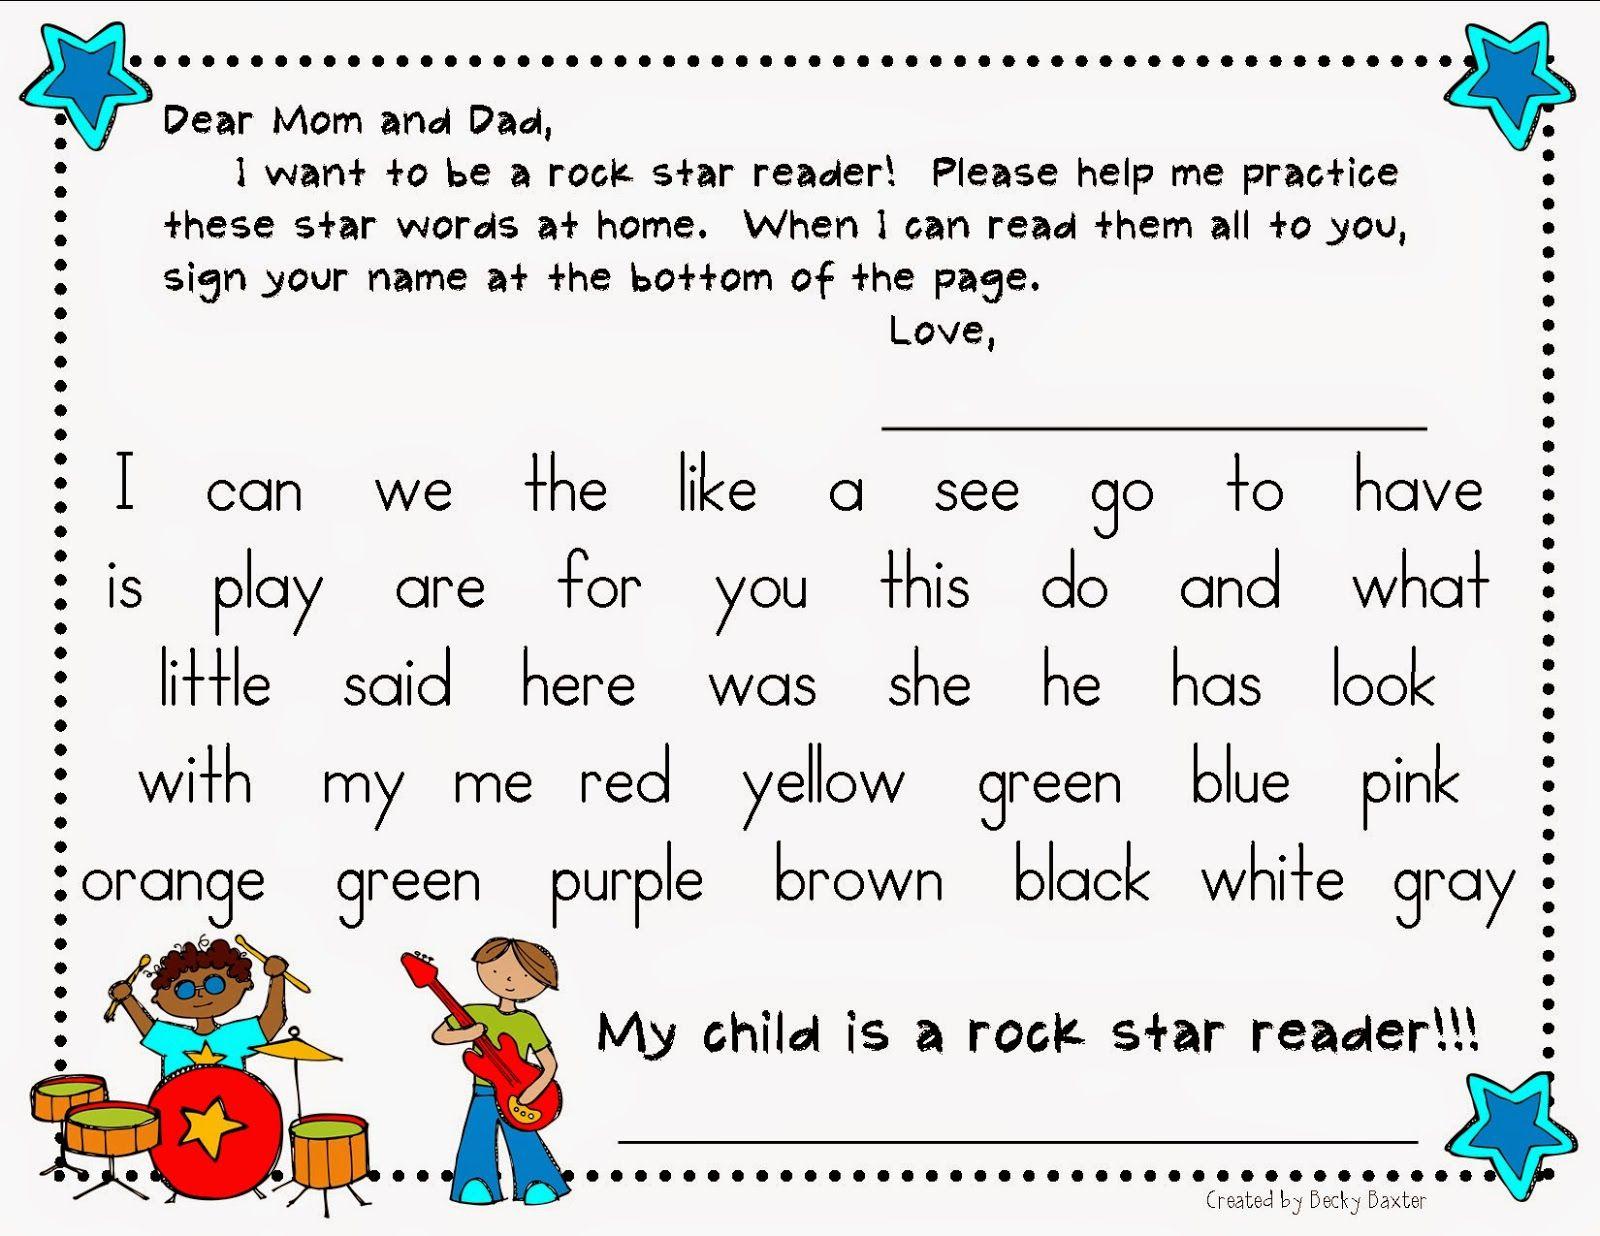 8cd37152ff682510a3e3a0fefe5750b9 - Teaching Kindergarten Reading